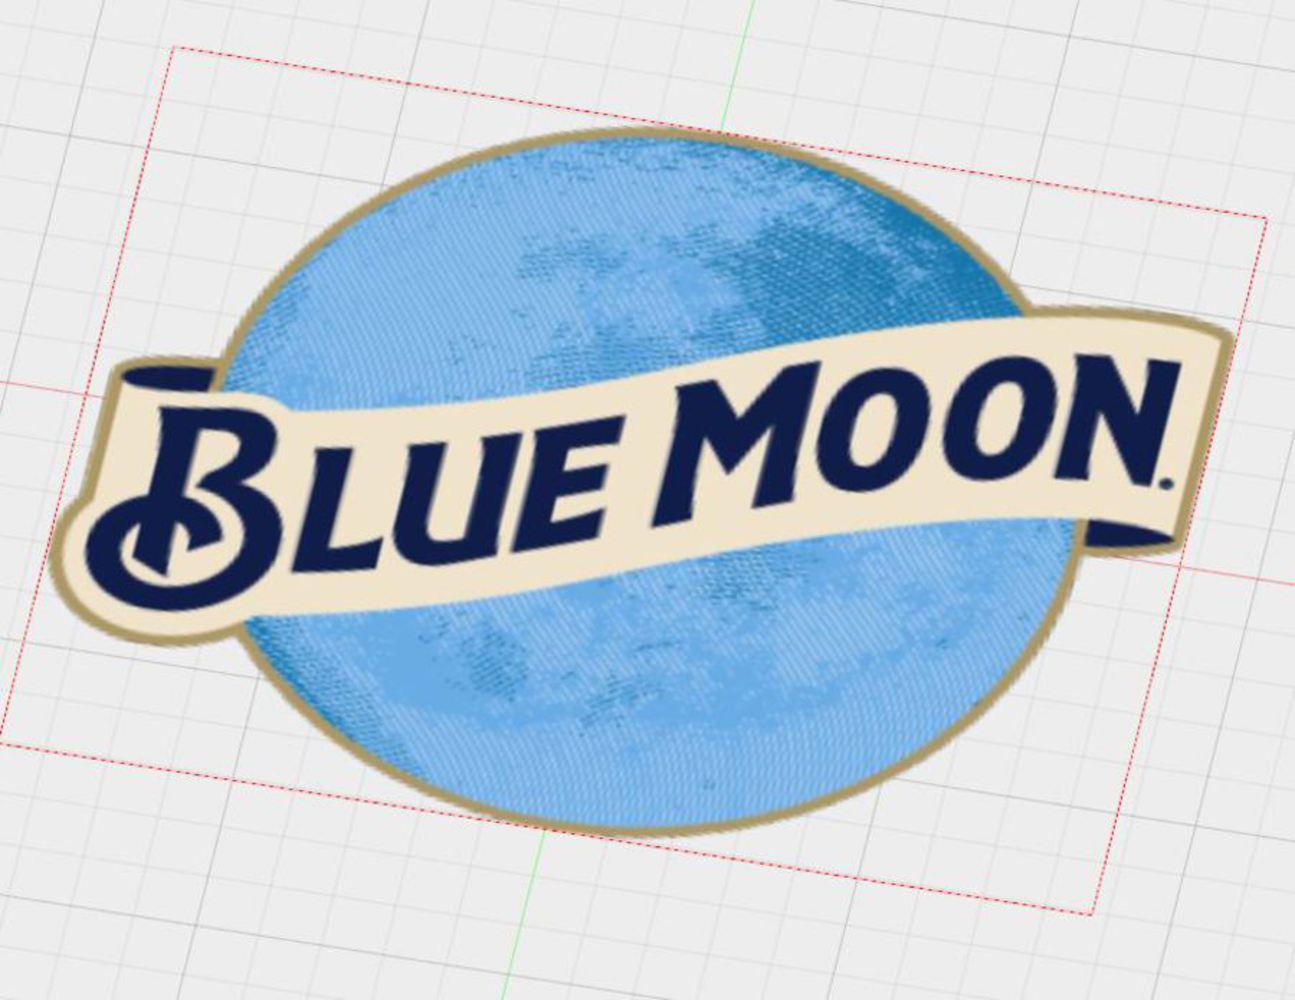 Blue moon logo original.jpg.thumb